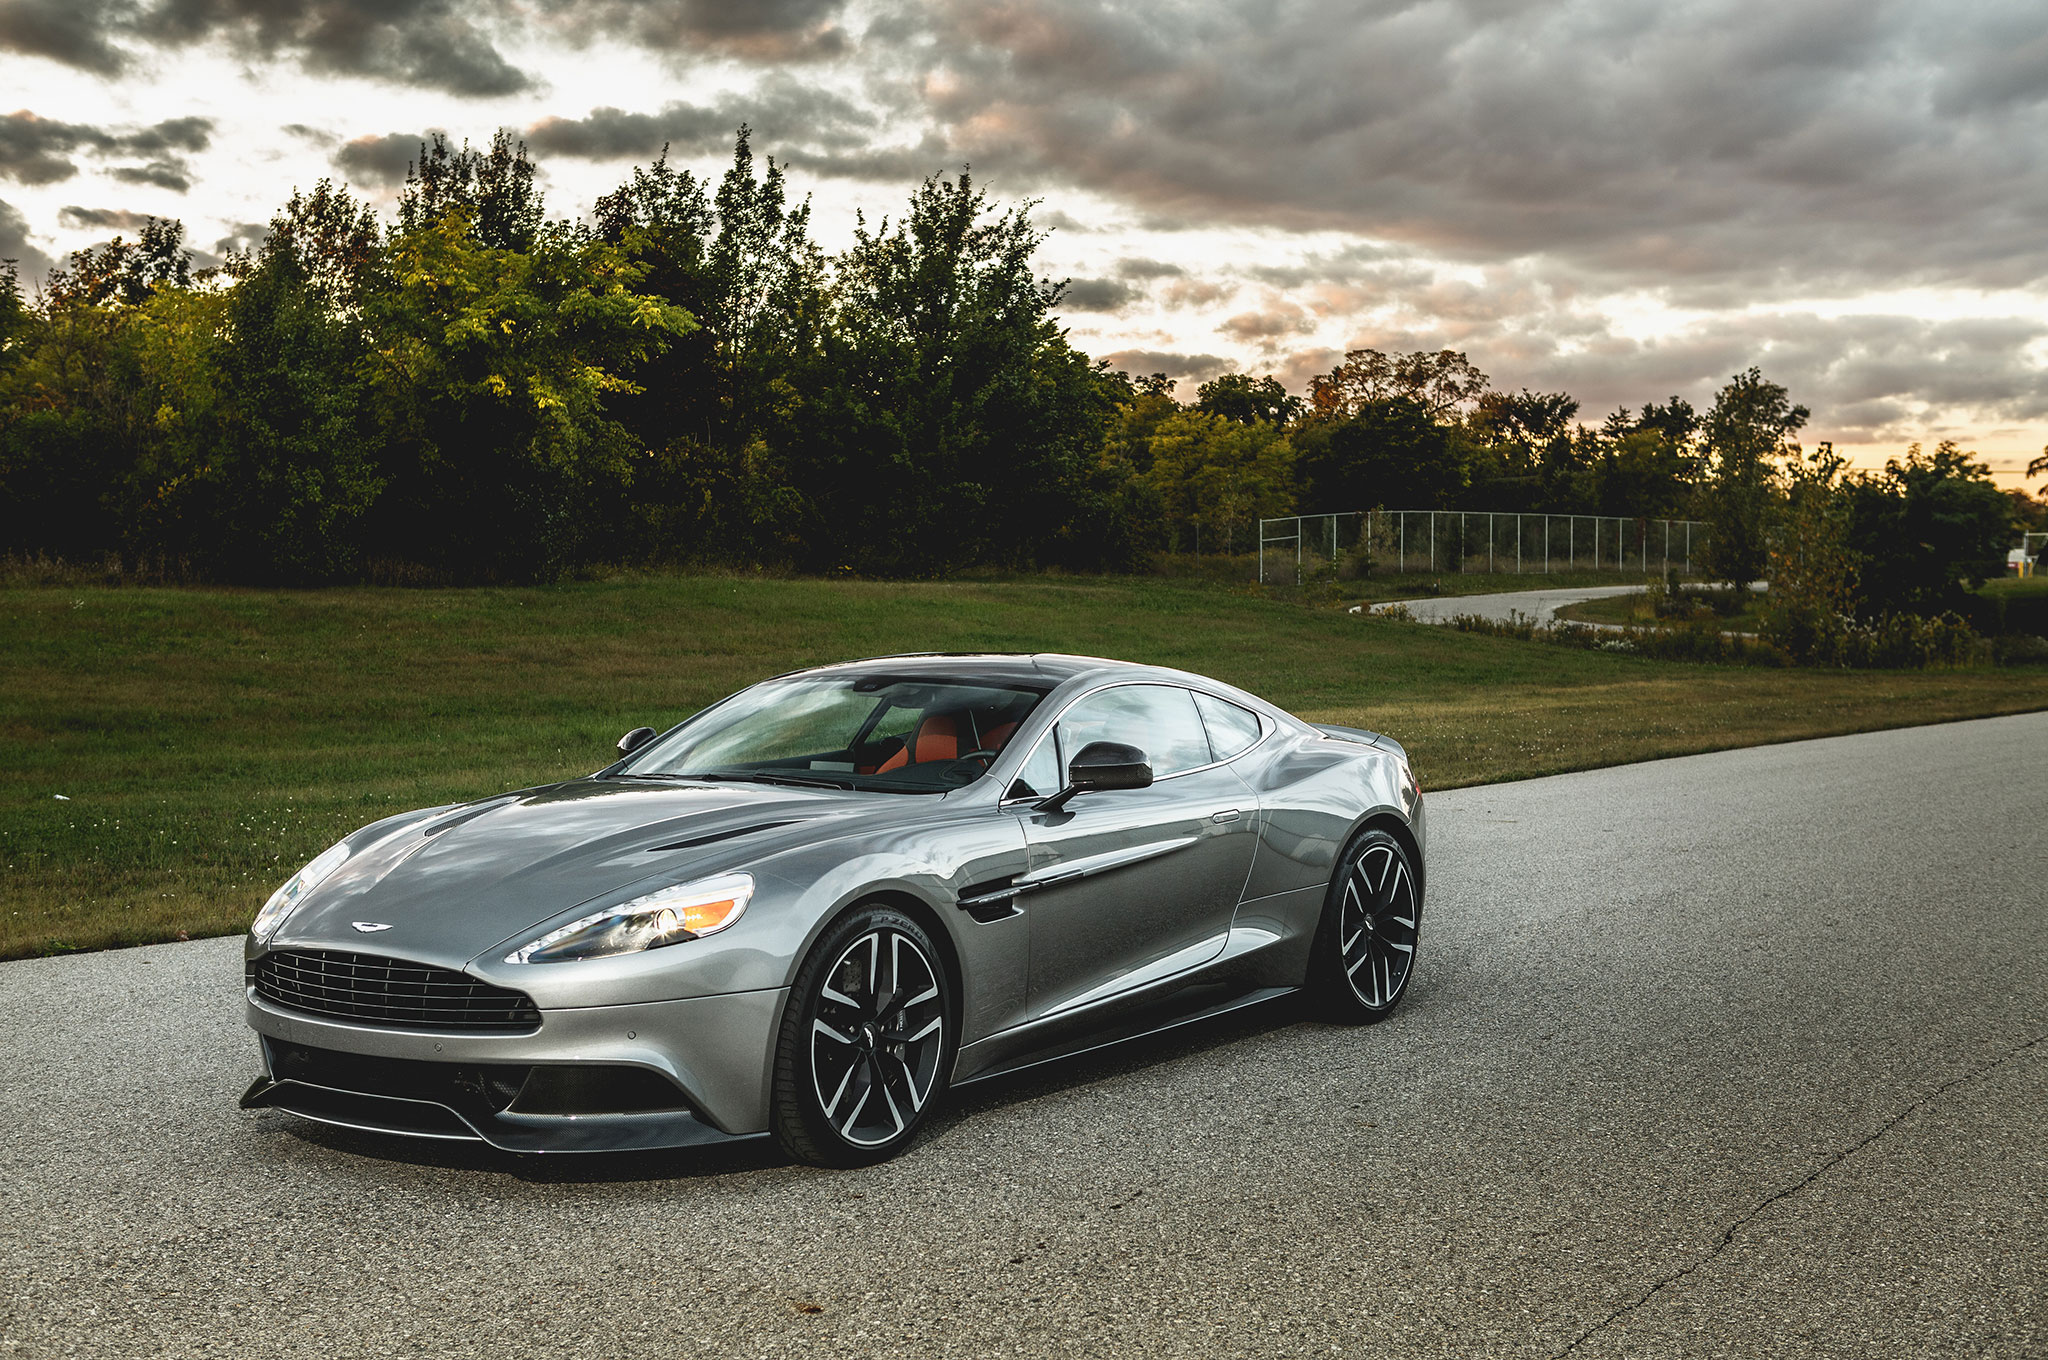 report: next-gen aston martin vanquish could have over 700 hp